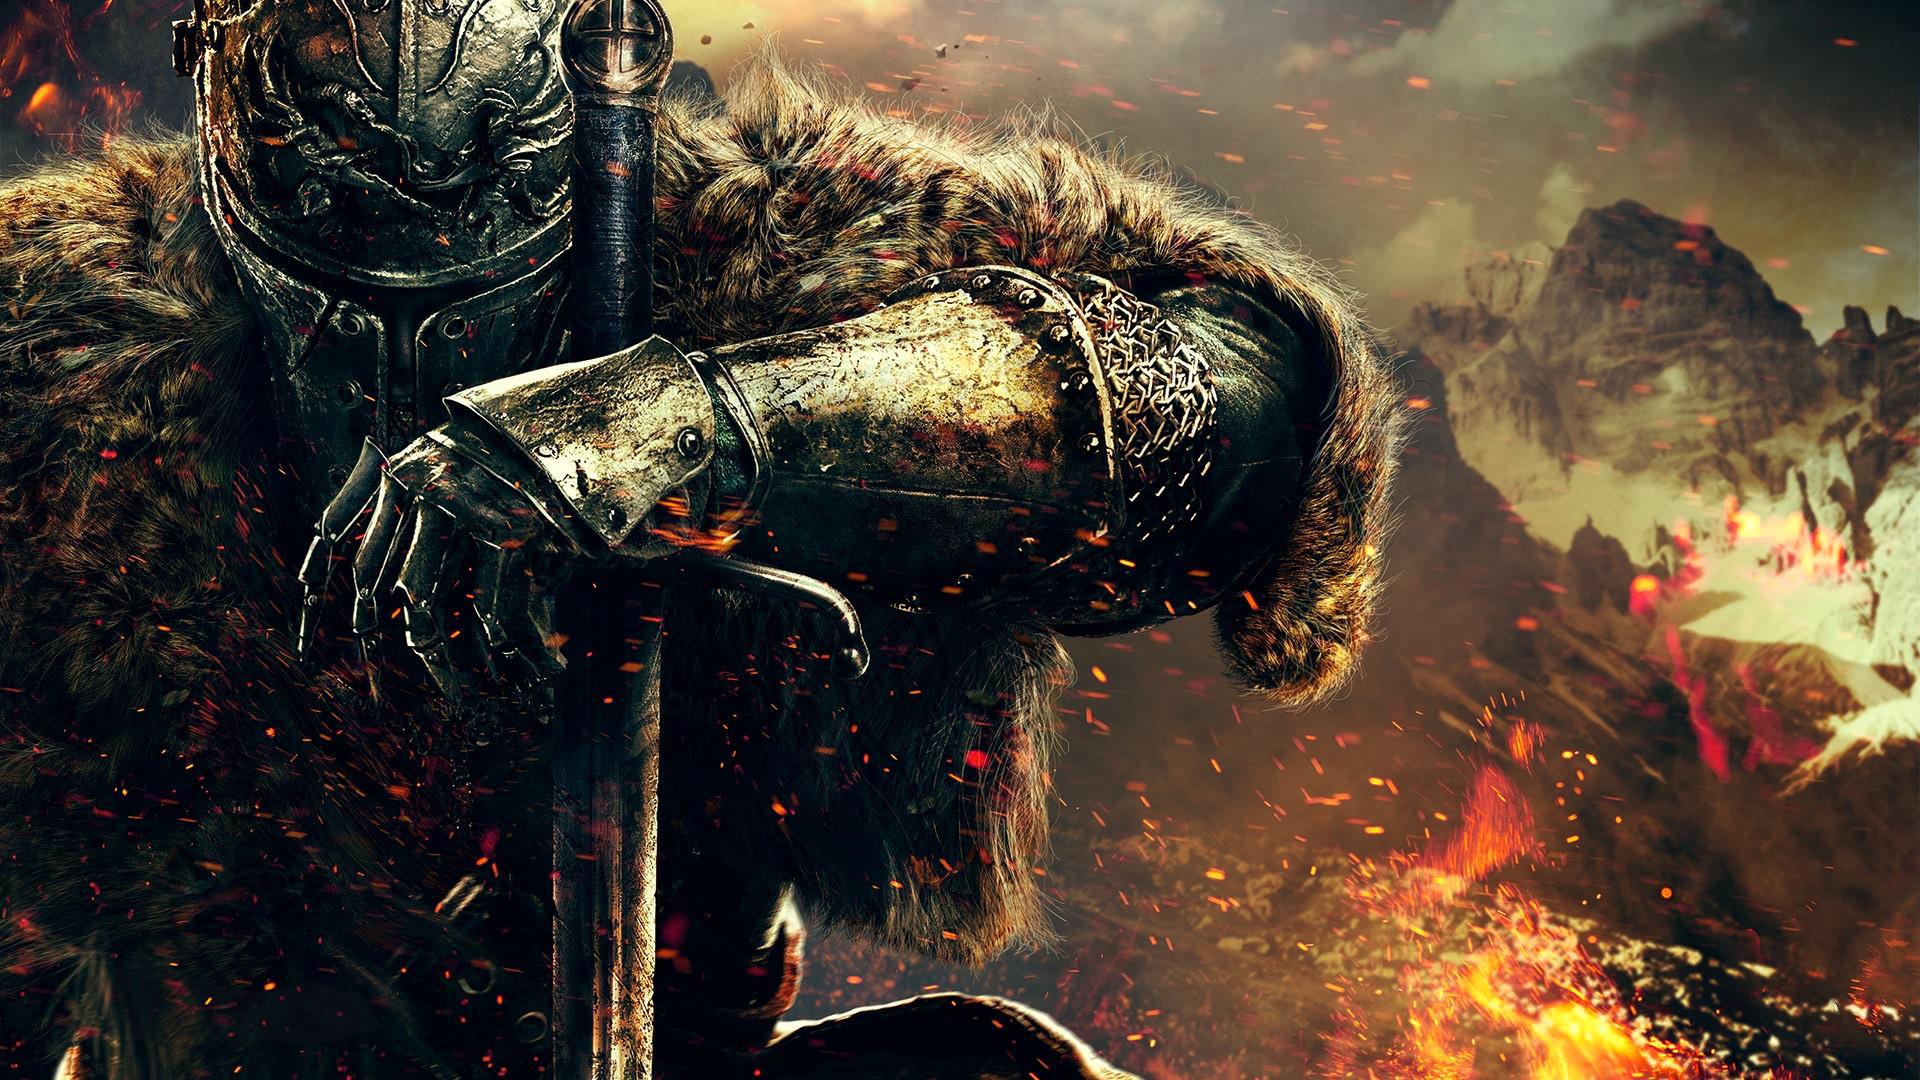 Dark Souls II Full HD Wallpaper And Background Image